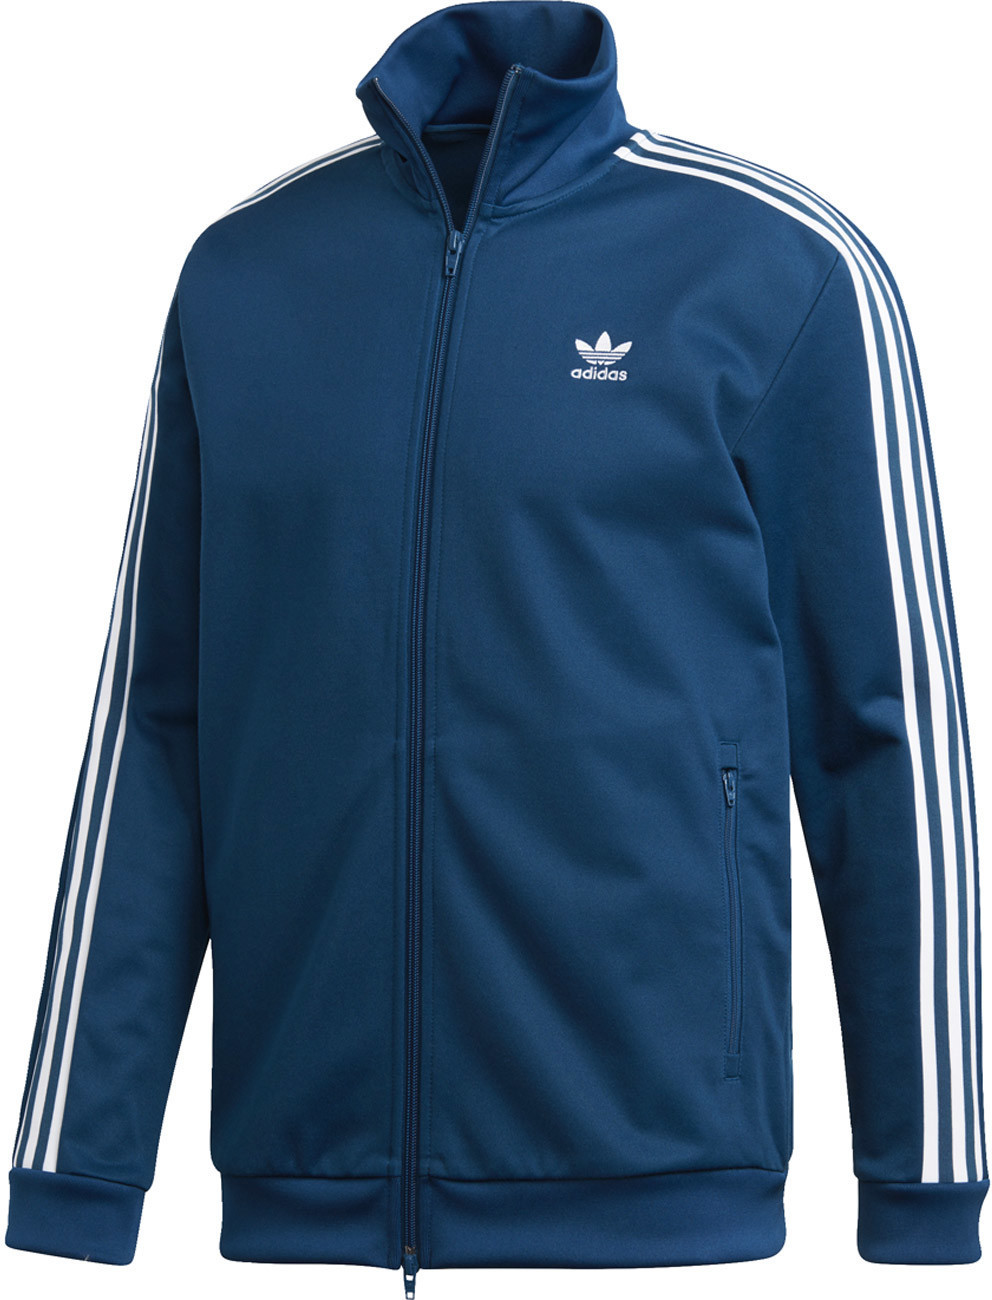 adidas Beckenbauer TT Chaqueta, Hombre, Marley, XL